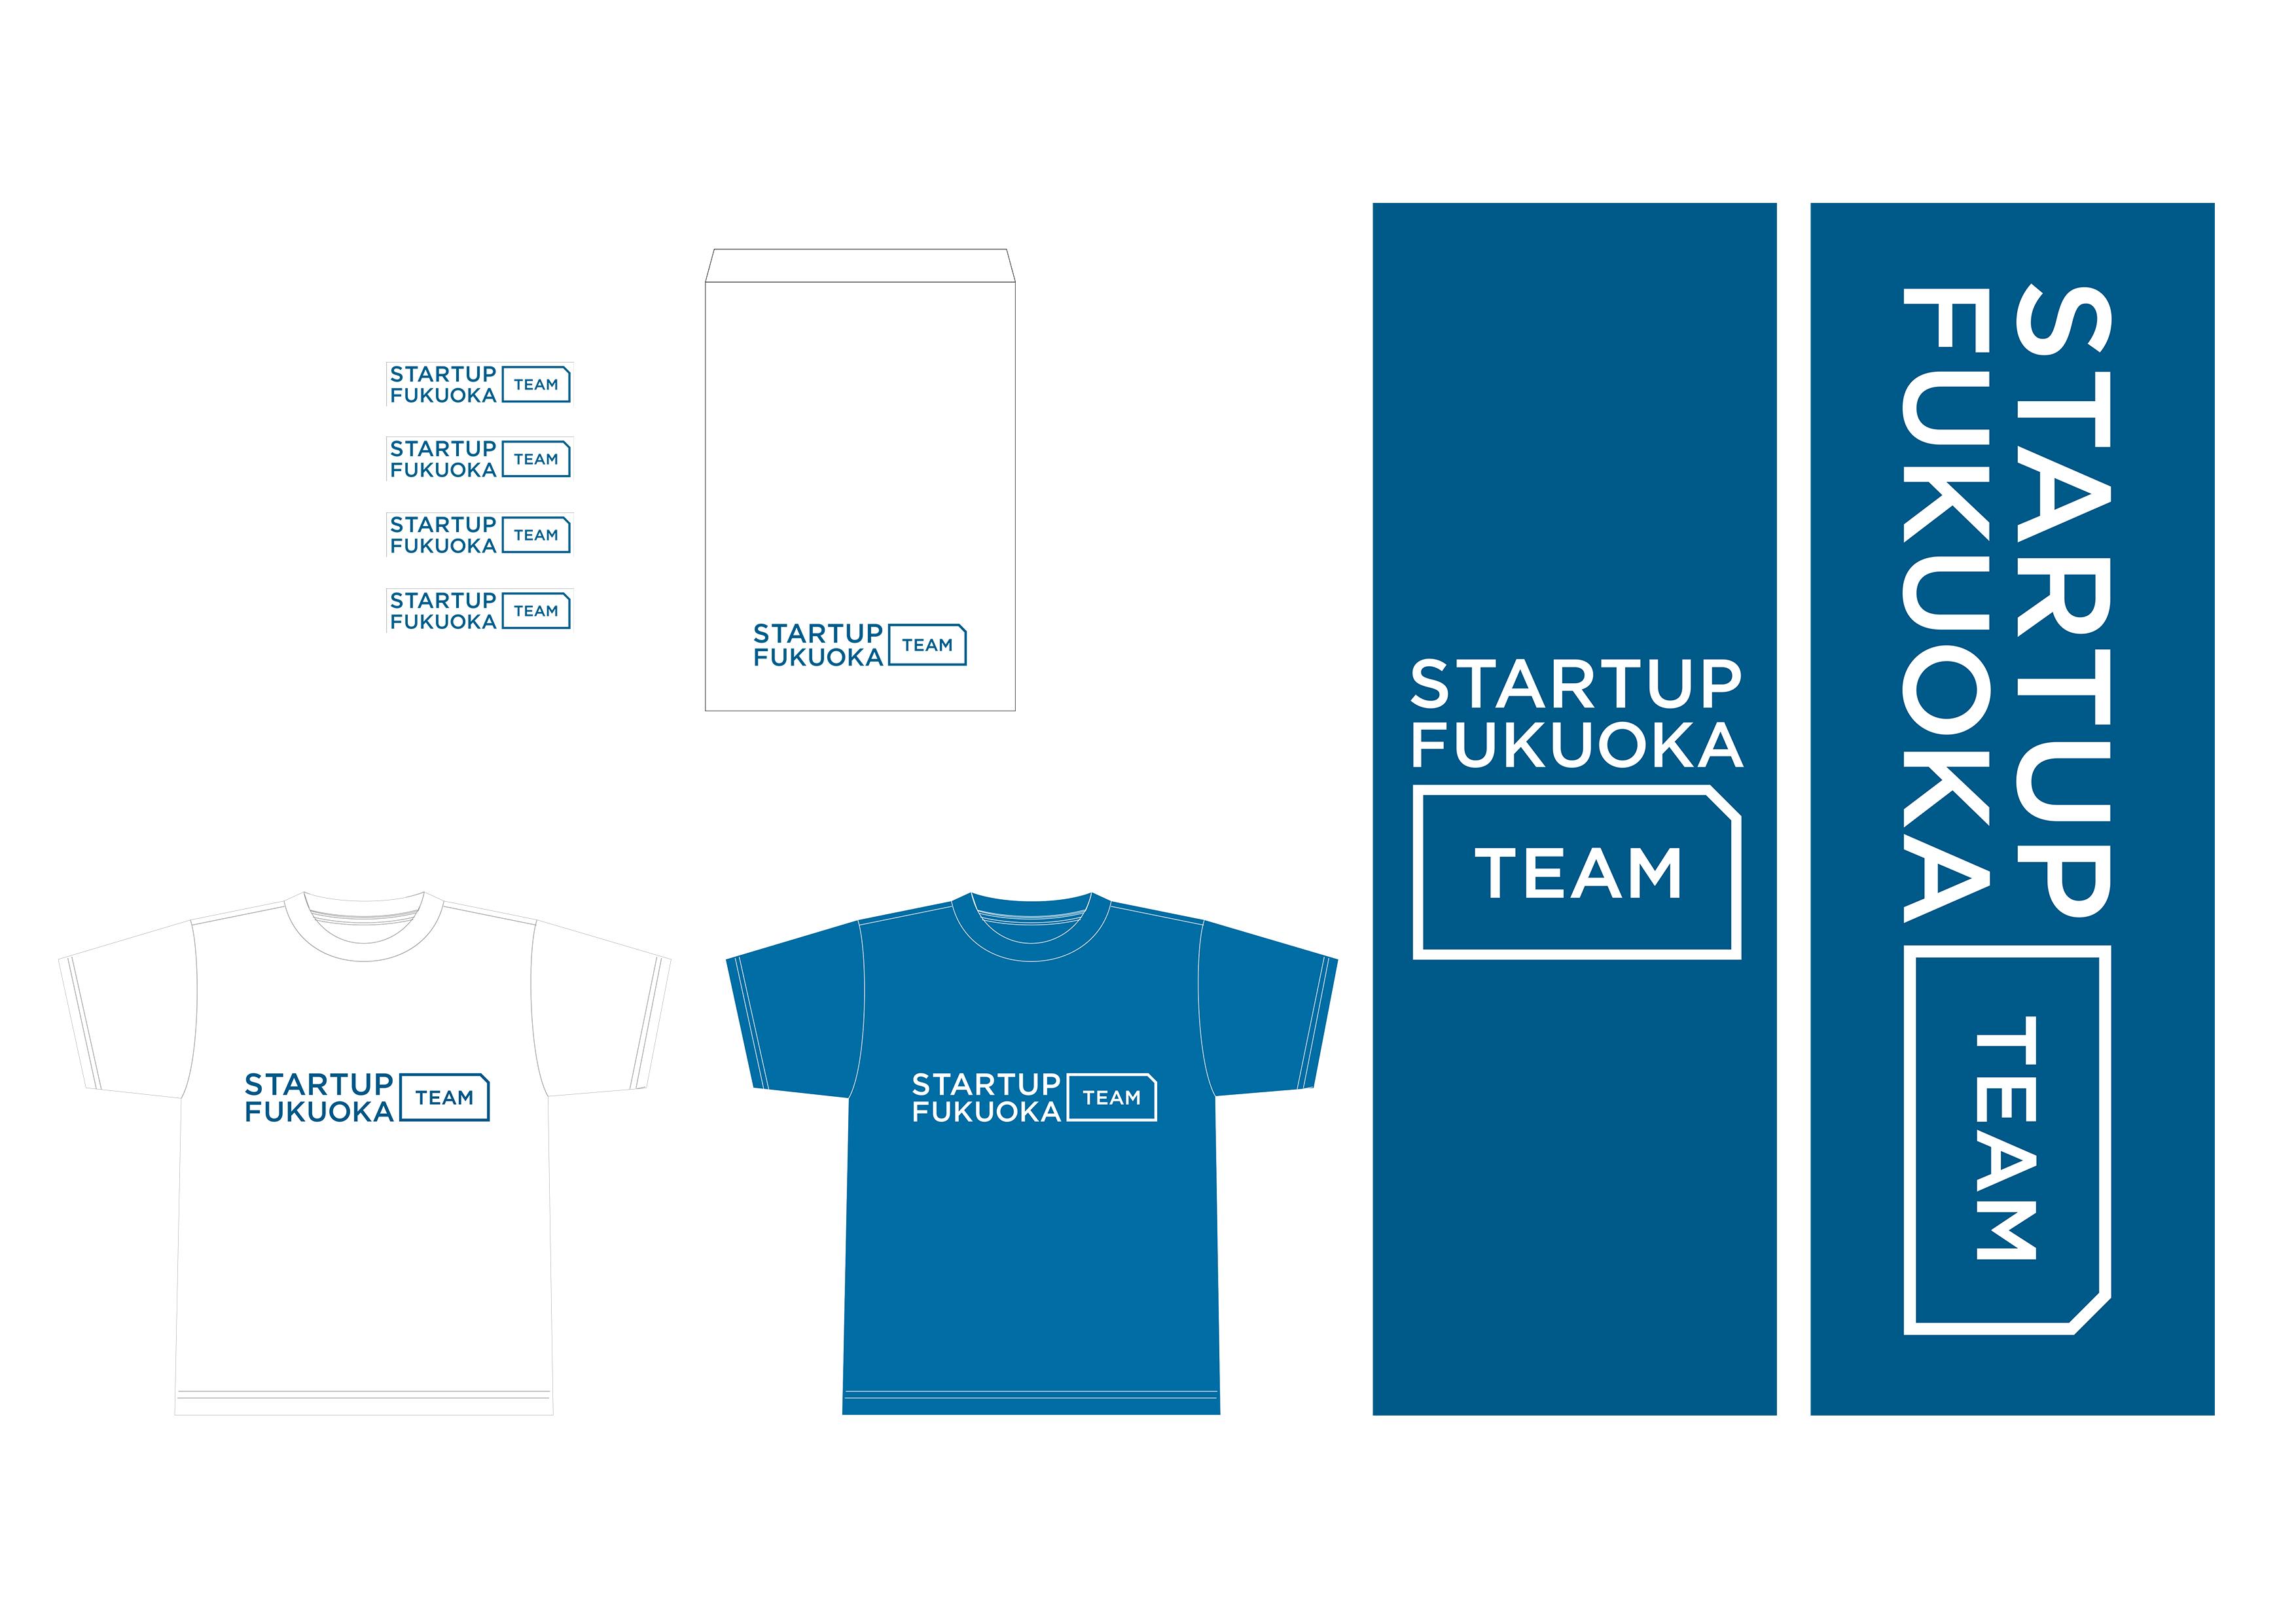 STF_tool_data